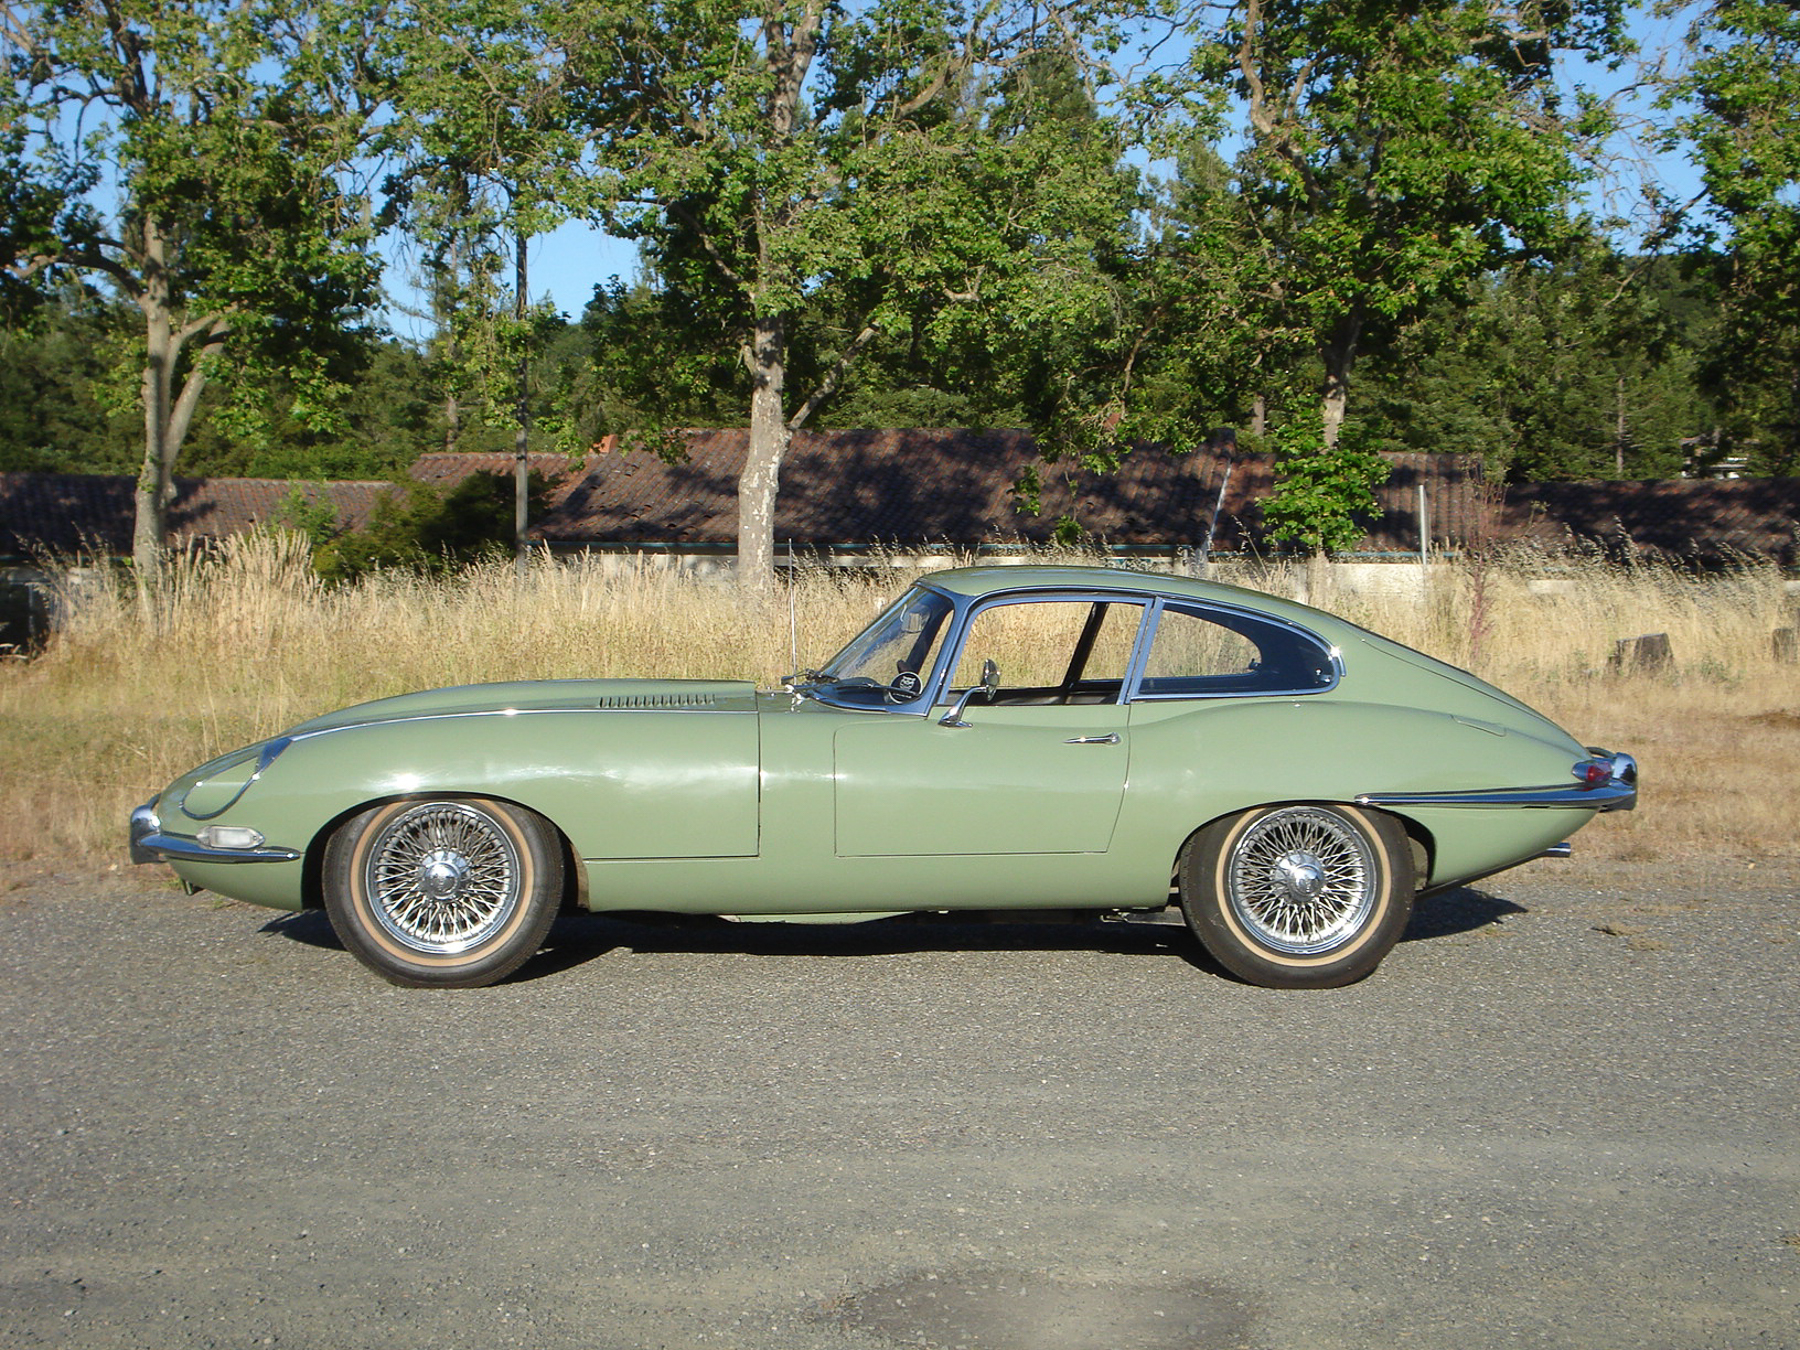 rent a classic car seattle jaguar [ 1500 x 1125 Pixel ]